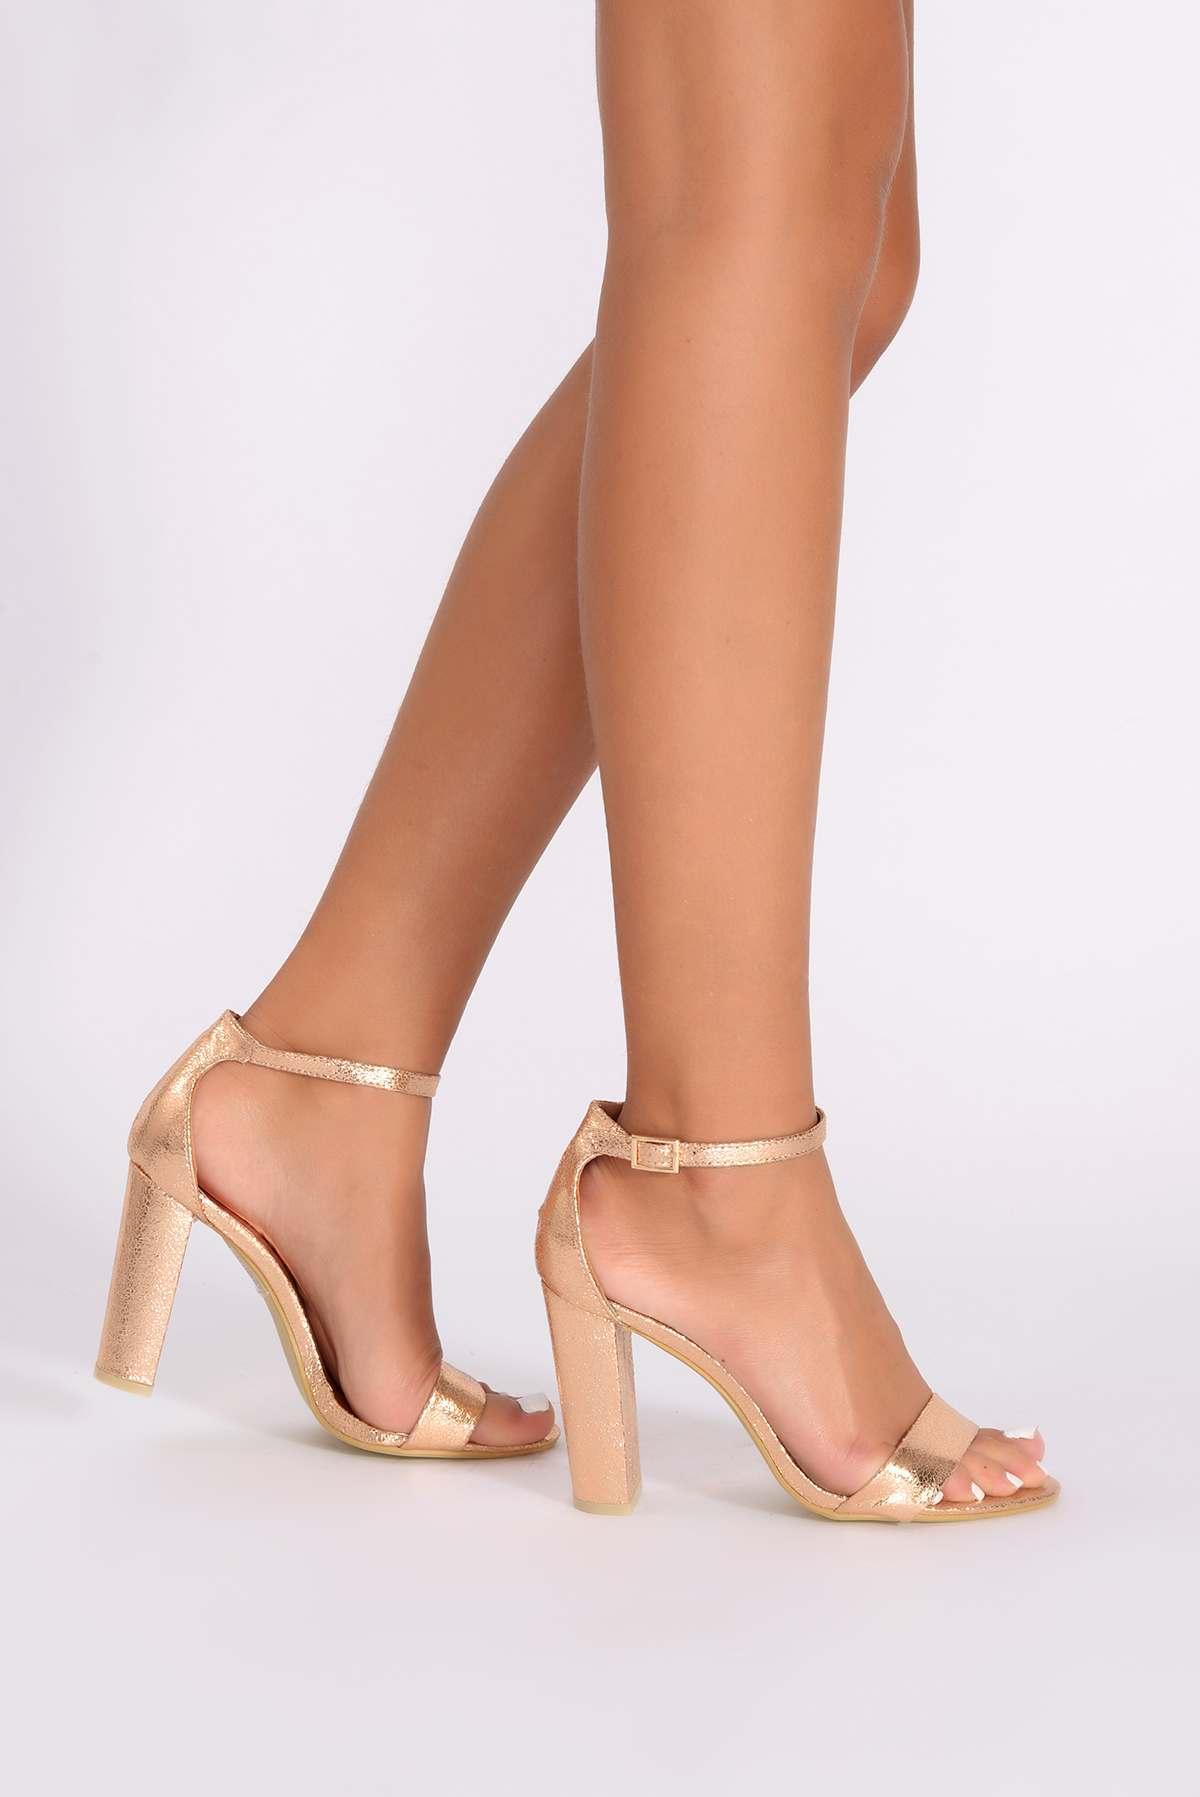 Metallic Strap Heels Ankle Gold Rose Morgan WEYID2eH9